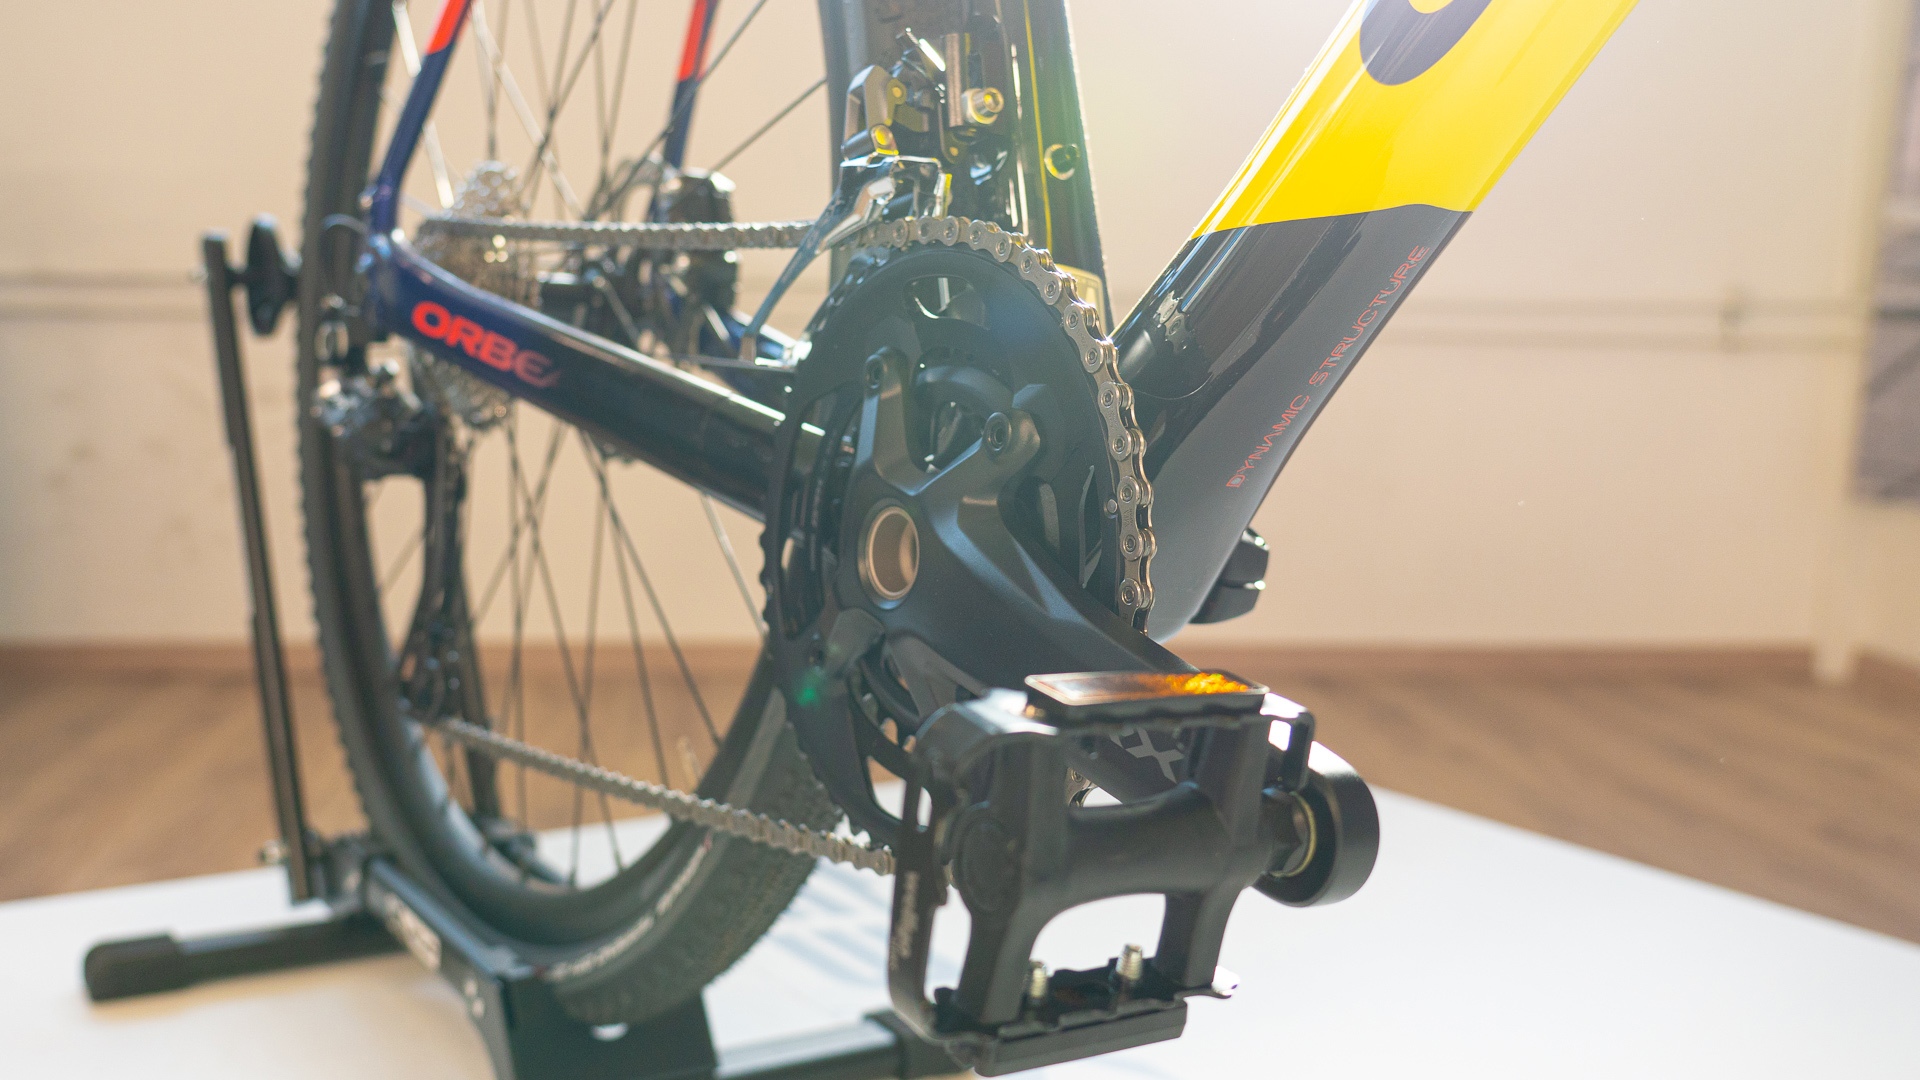 Fahrradzentrum Grauthoff Fotoshooting 20